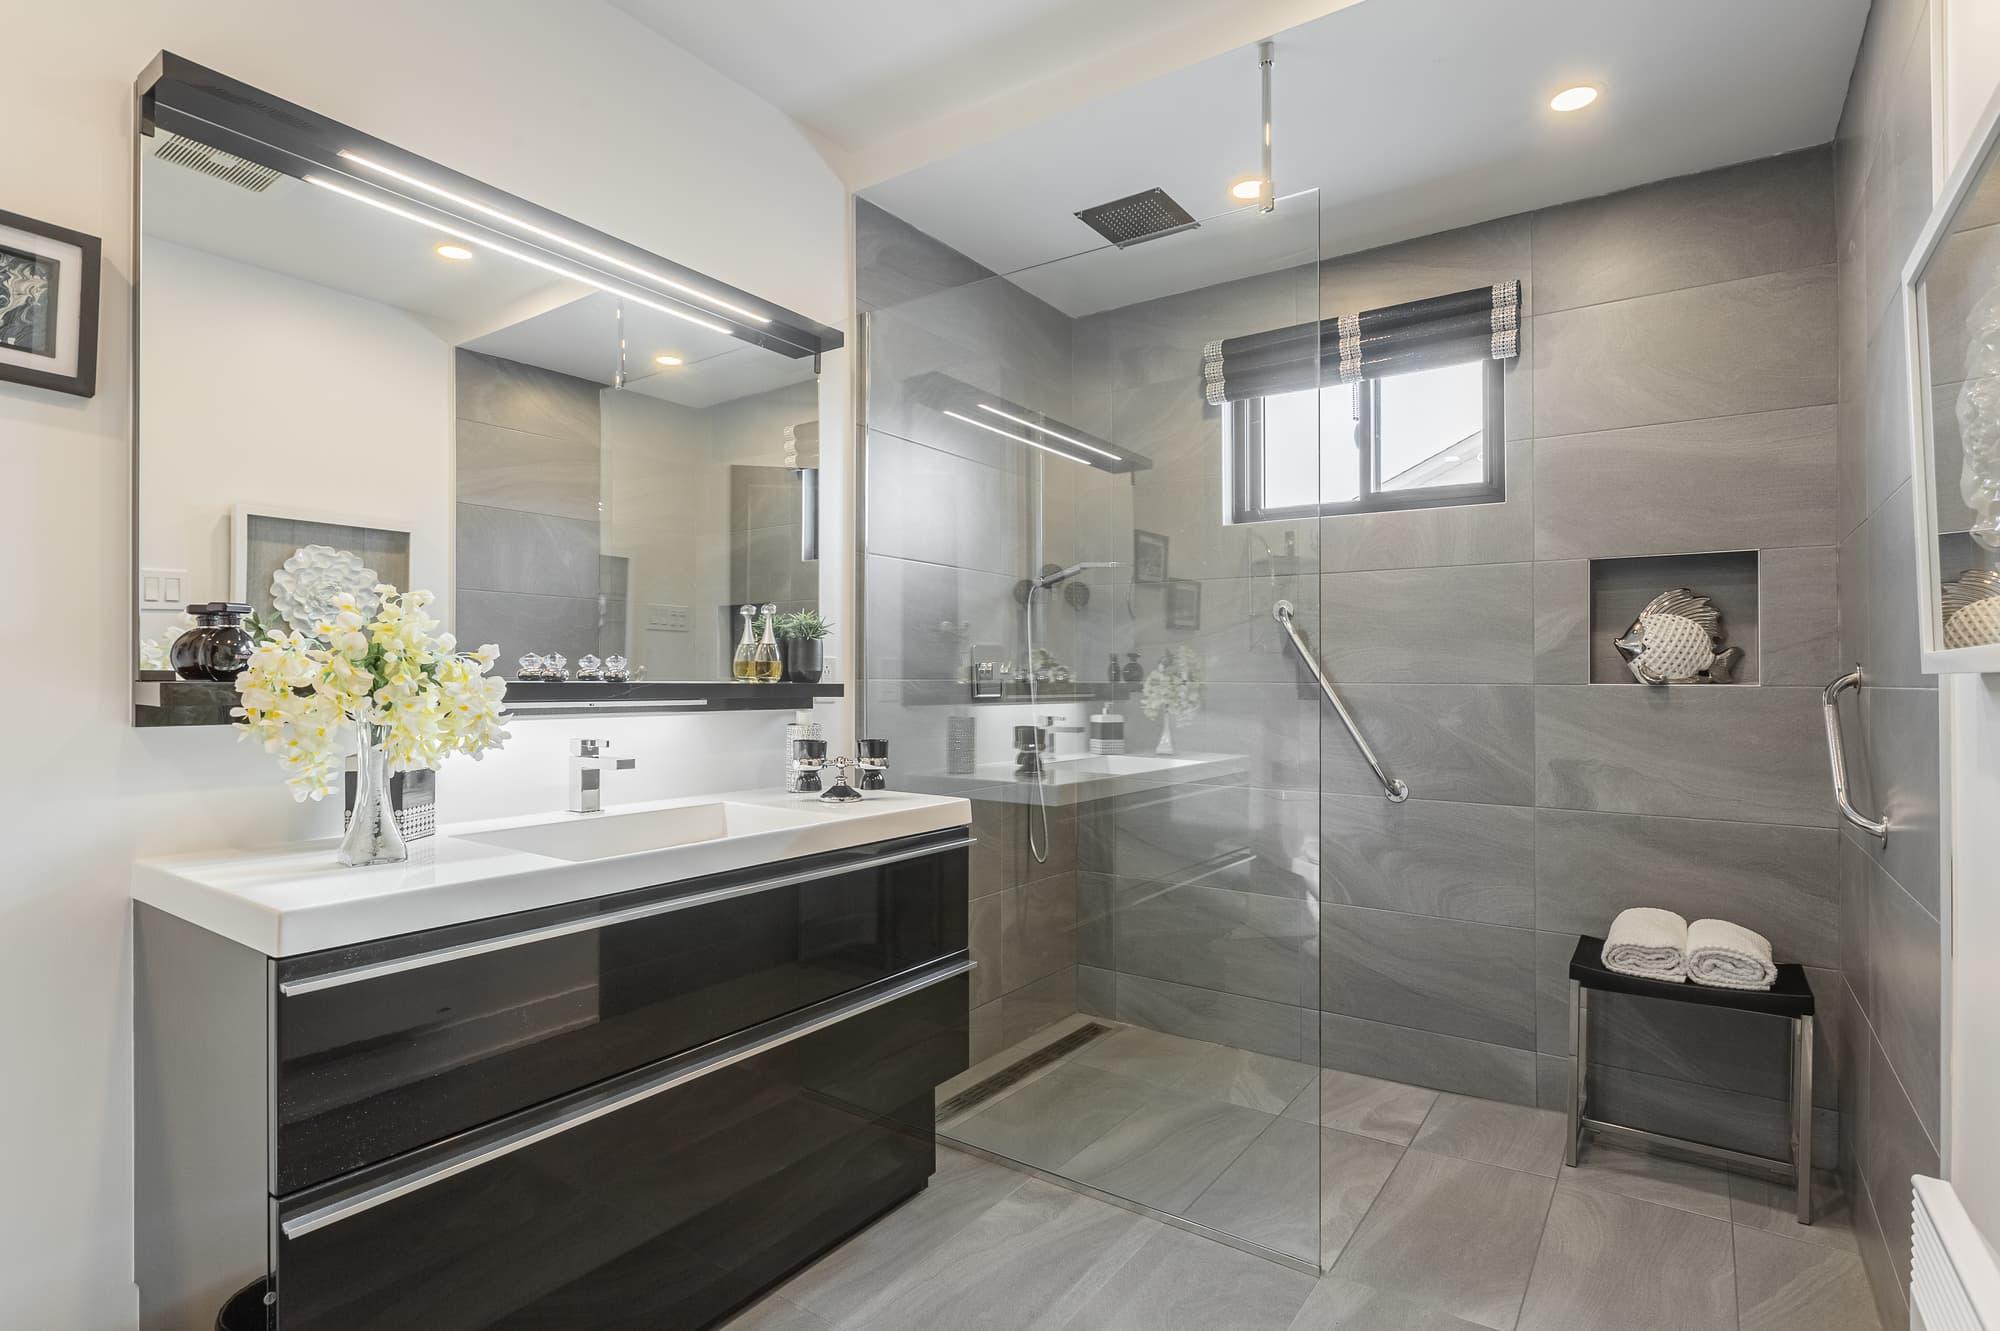 grey bathroom with walk-in shower and black vanity